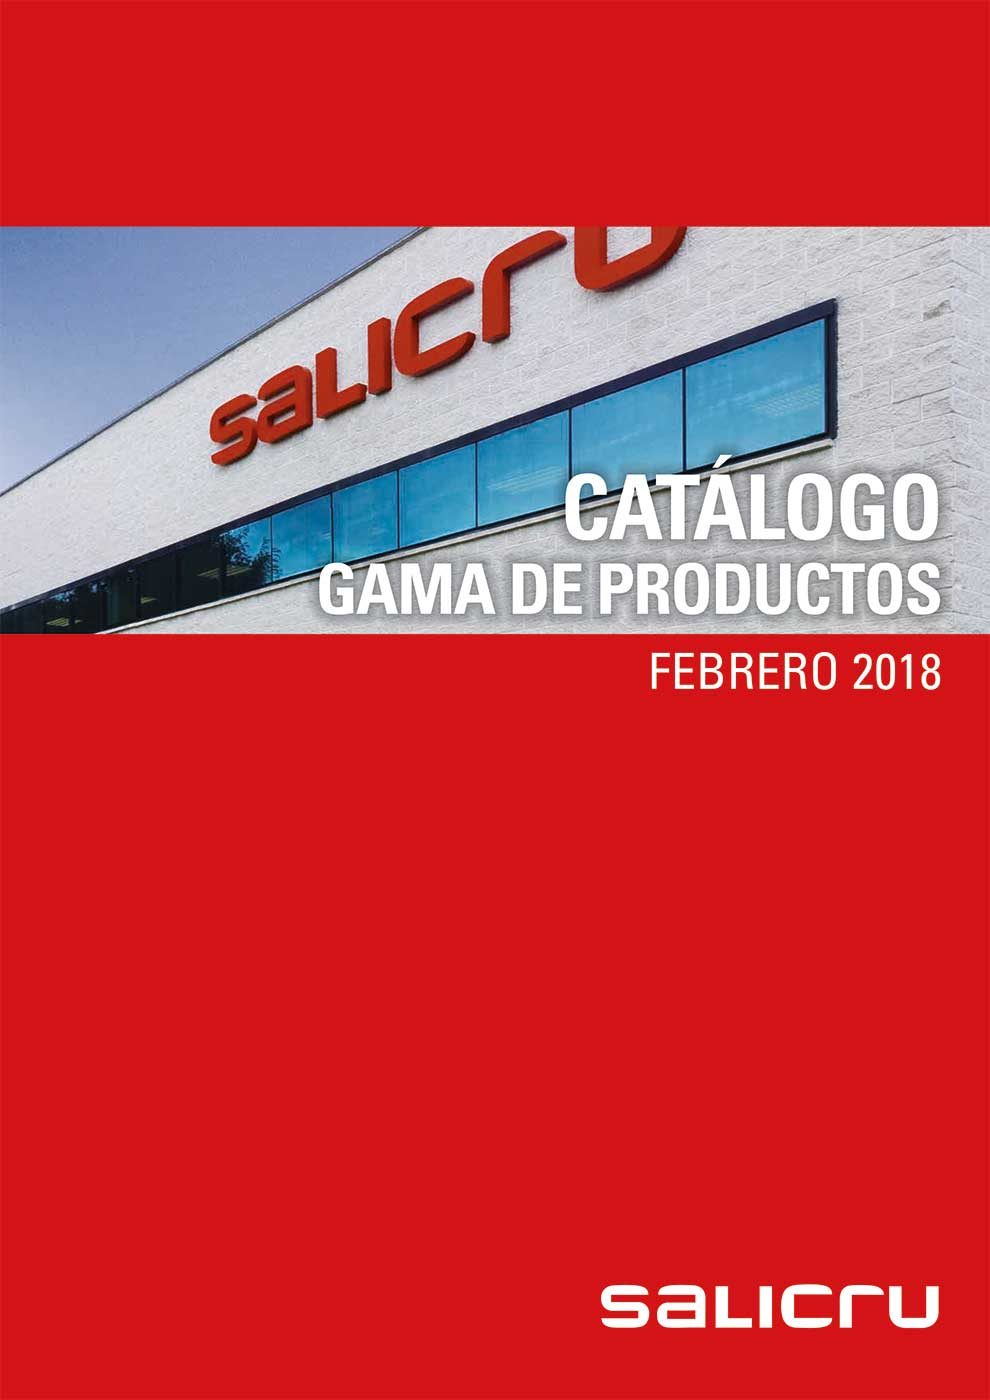 catalogo productos salicru